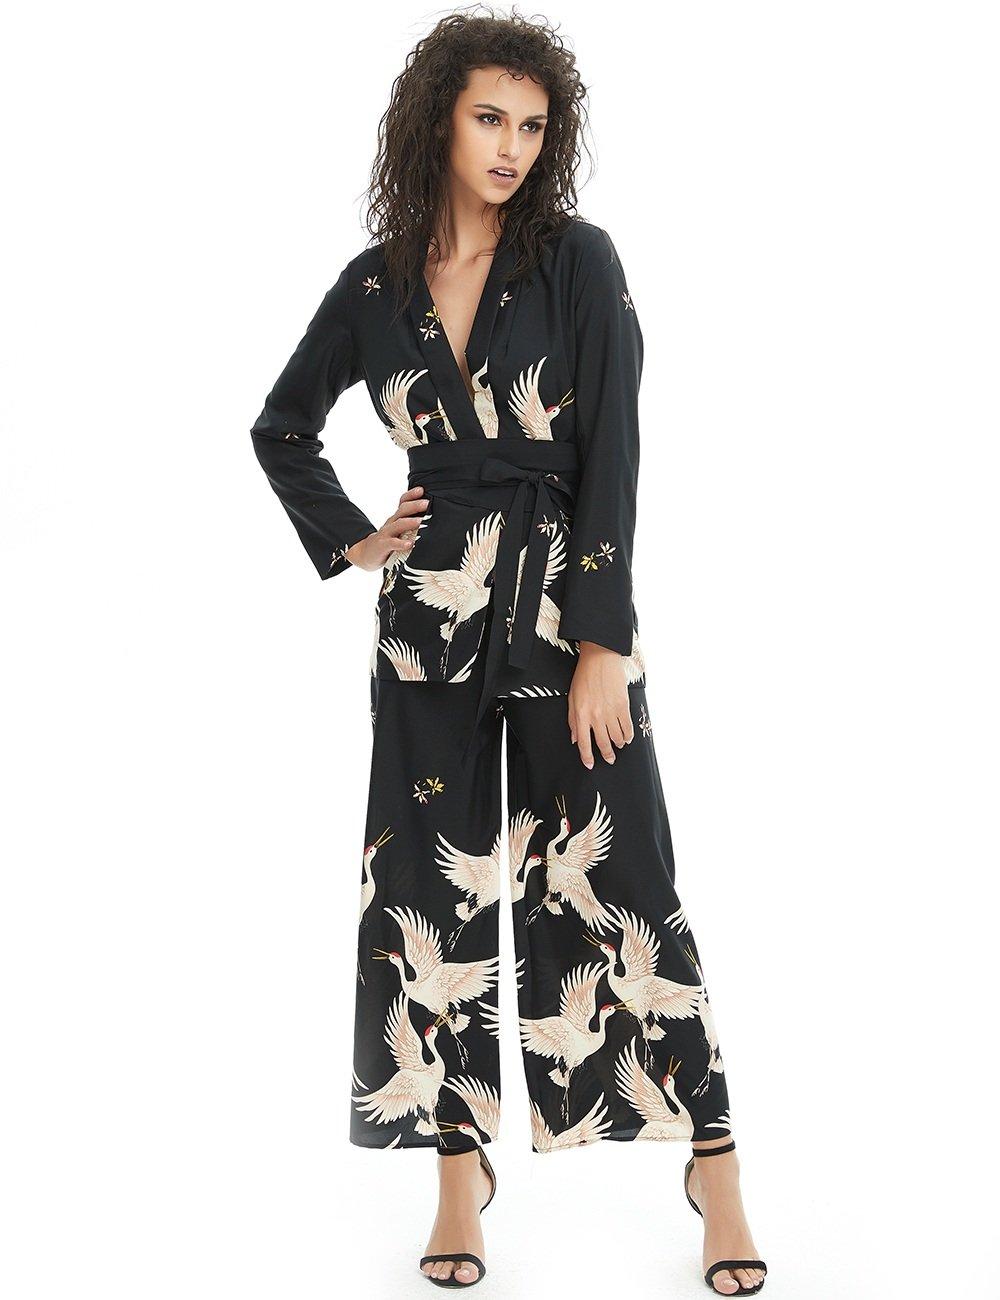 Deviz Queen Kimono Jacket Women Printed Crane (Black, M)